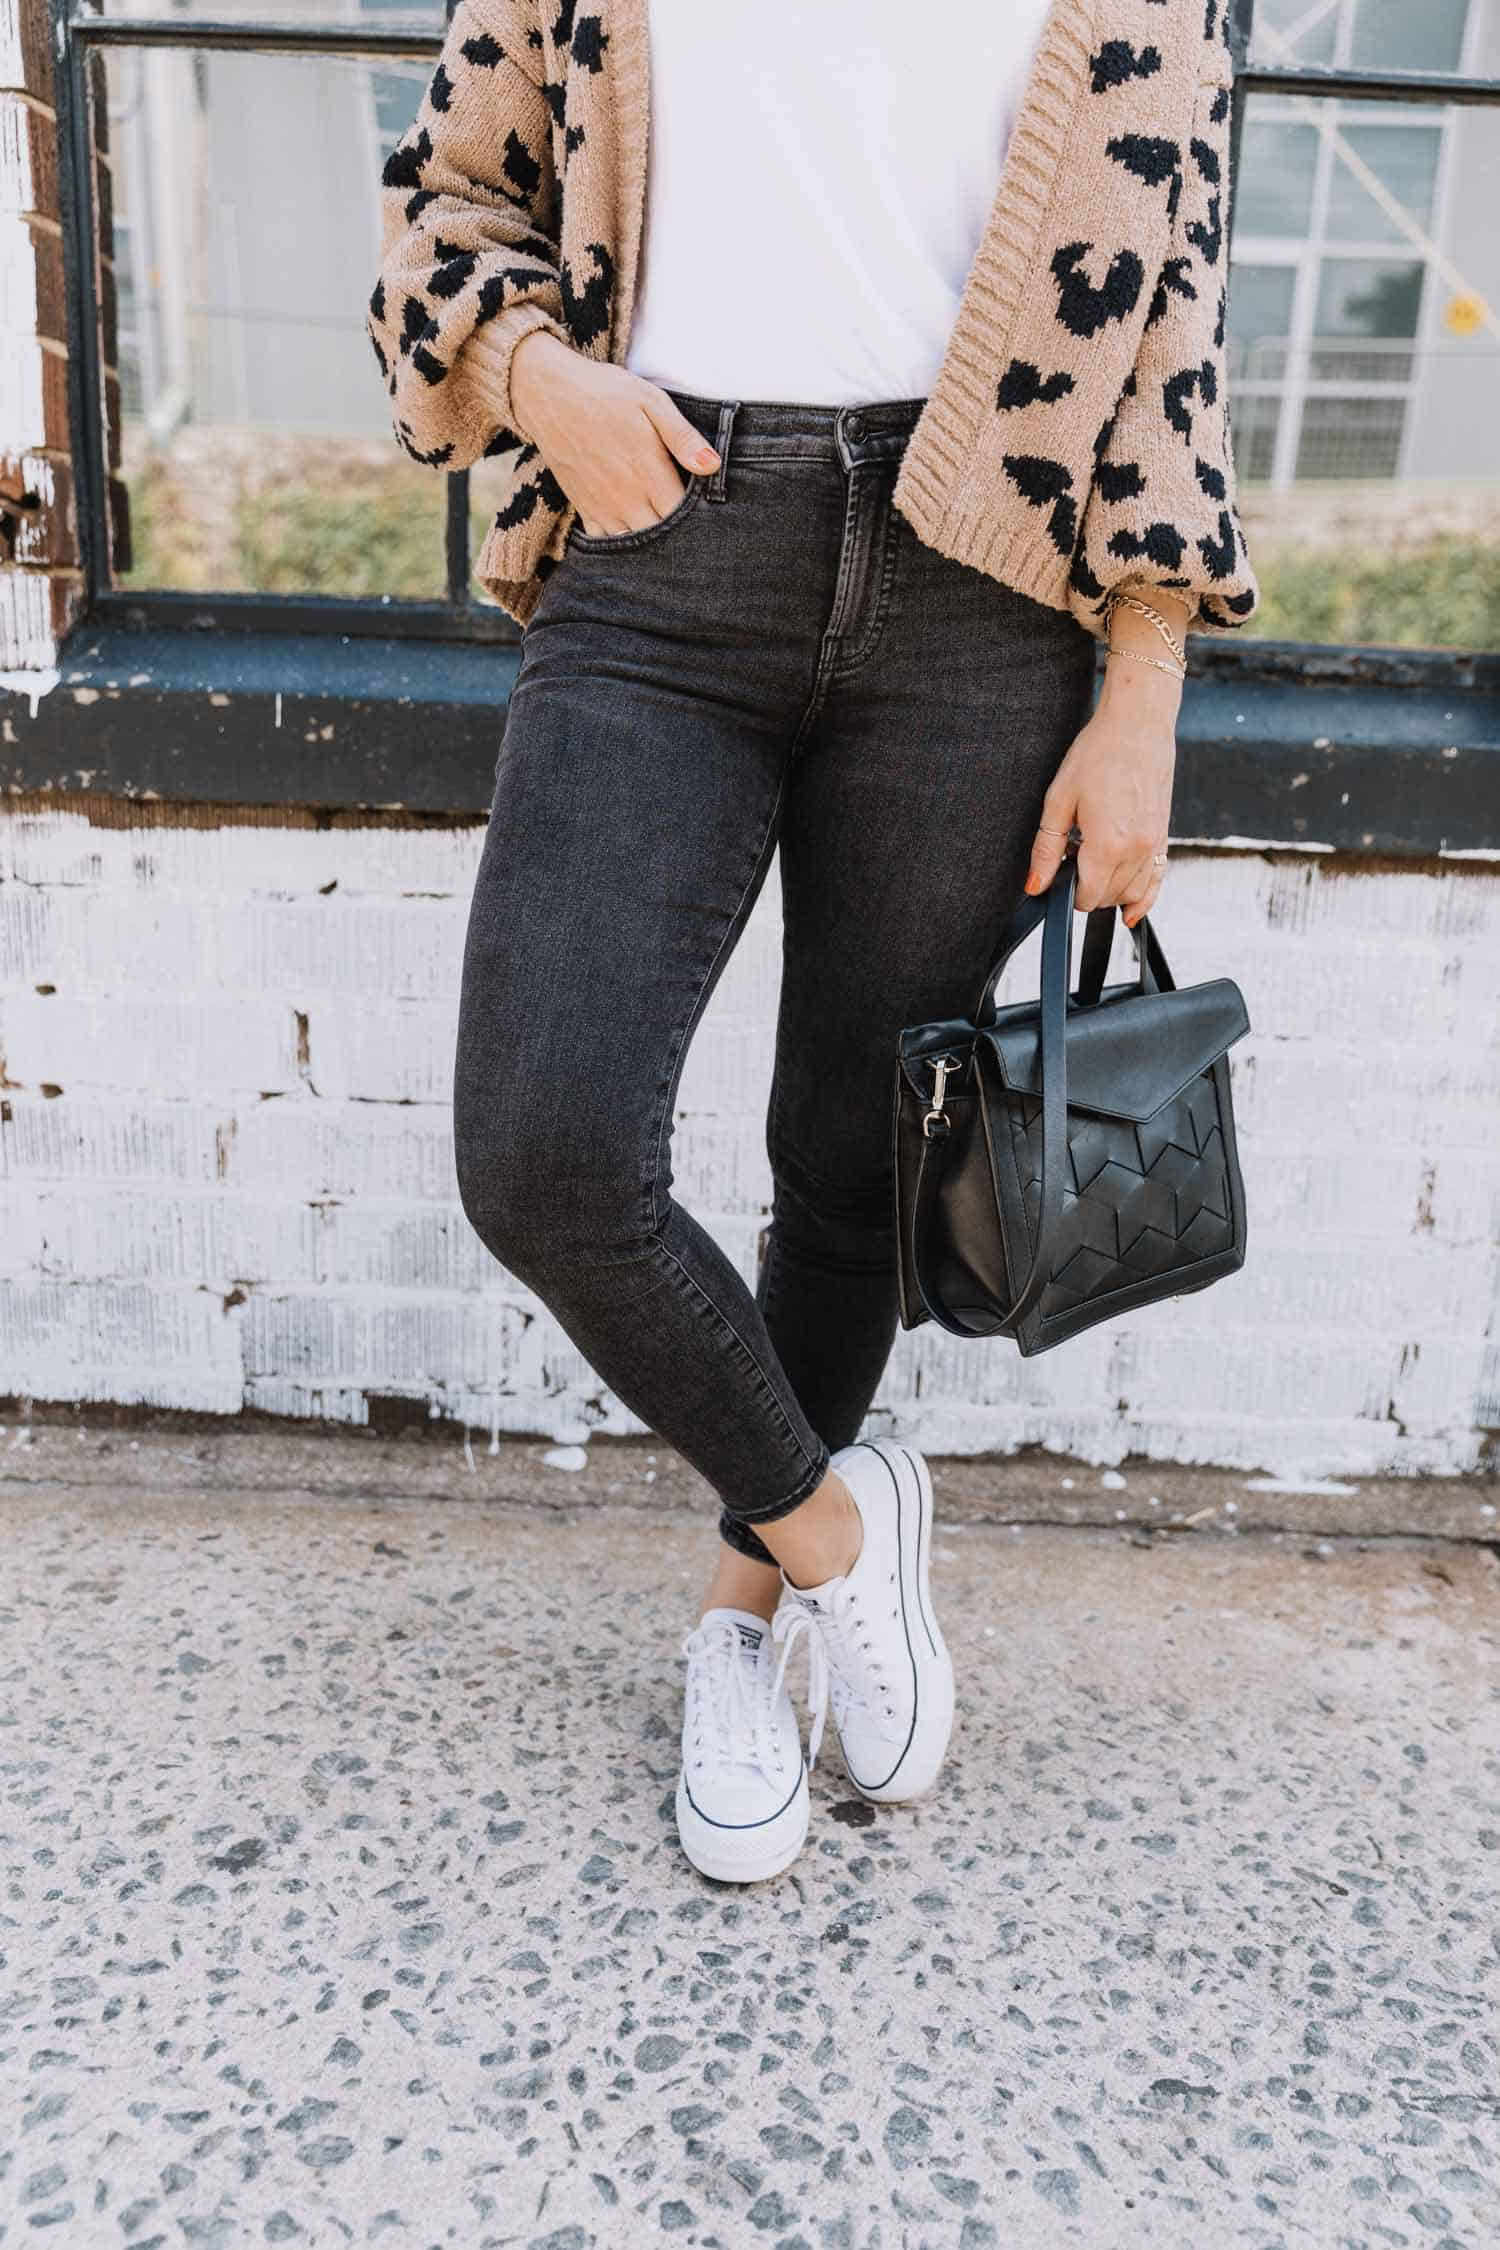 black everlane curvy jeans and platform converse